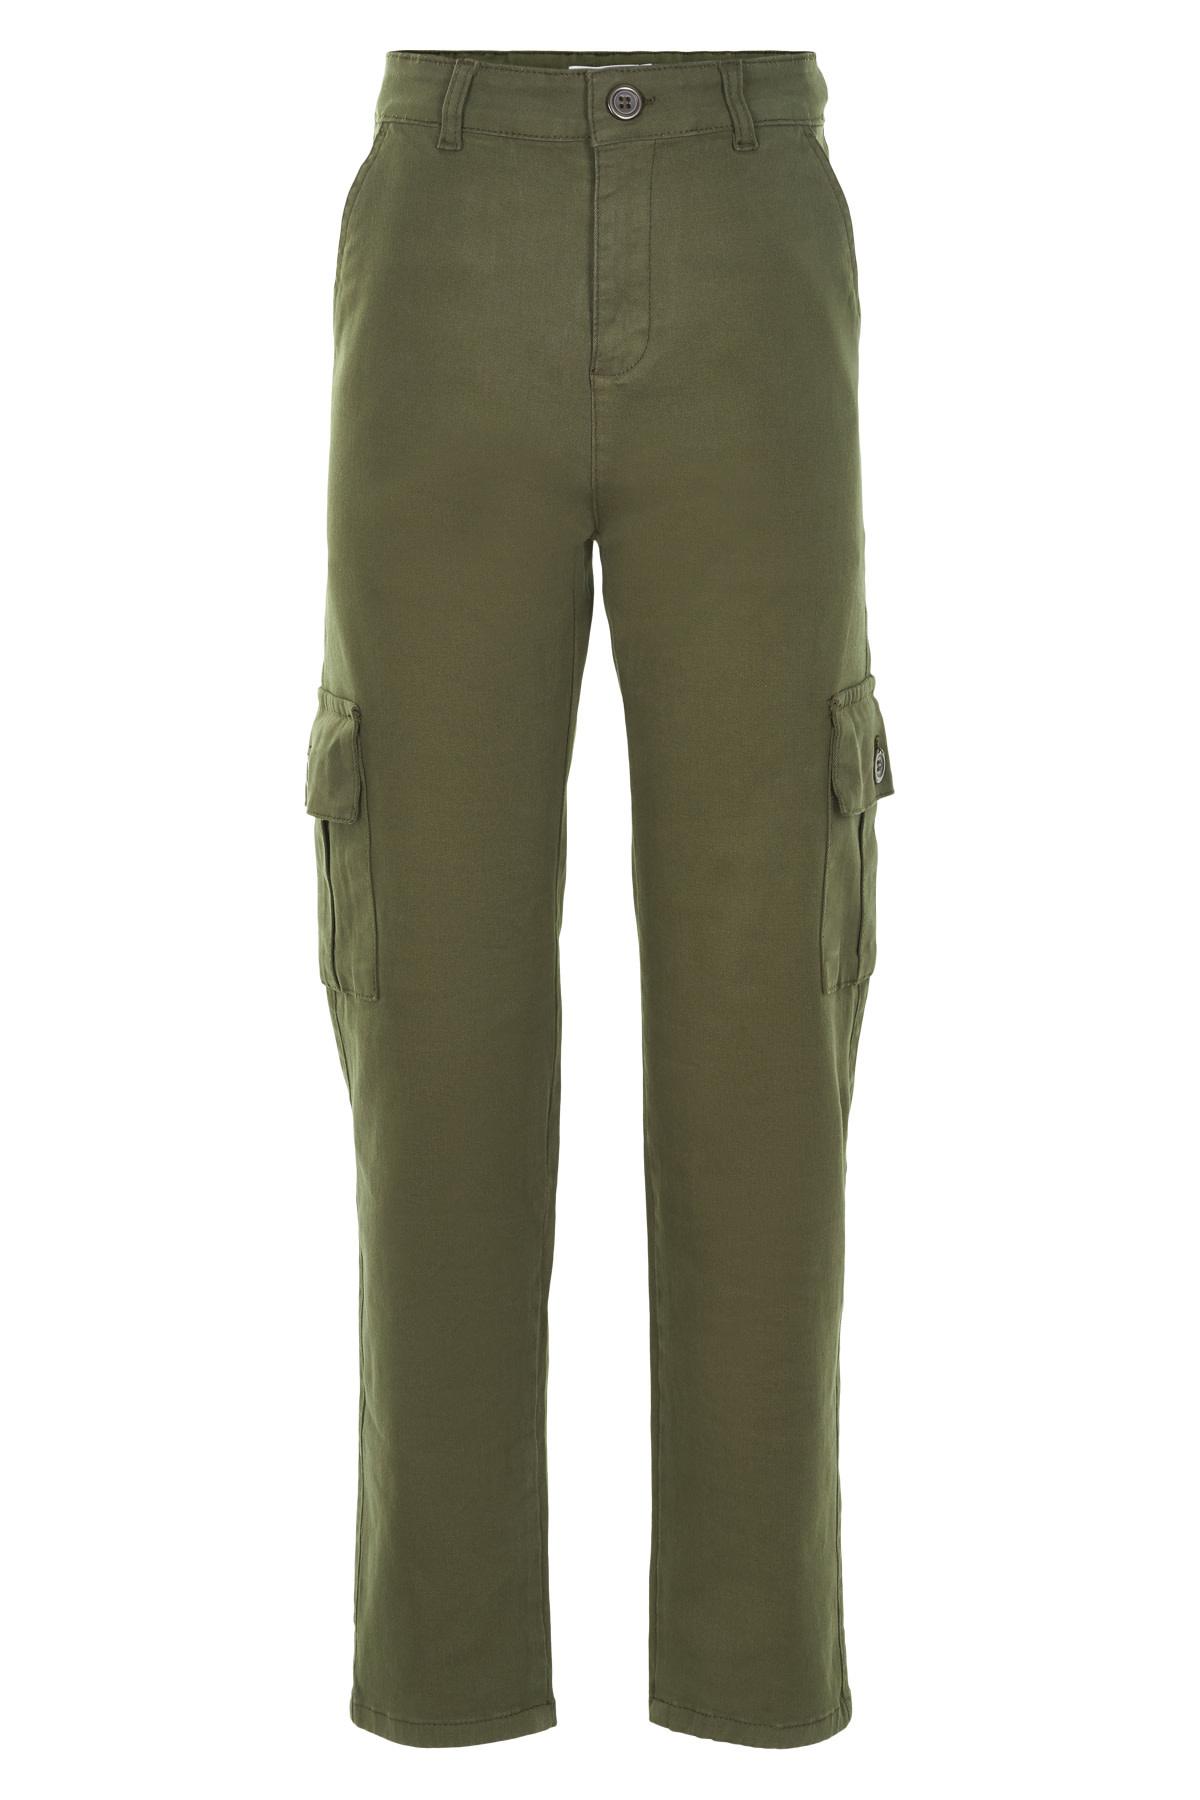 Cost - Bart Kean Cargo Pants